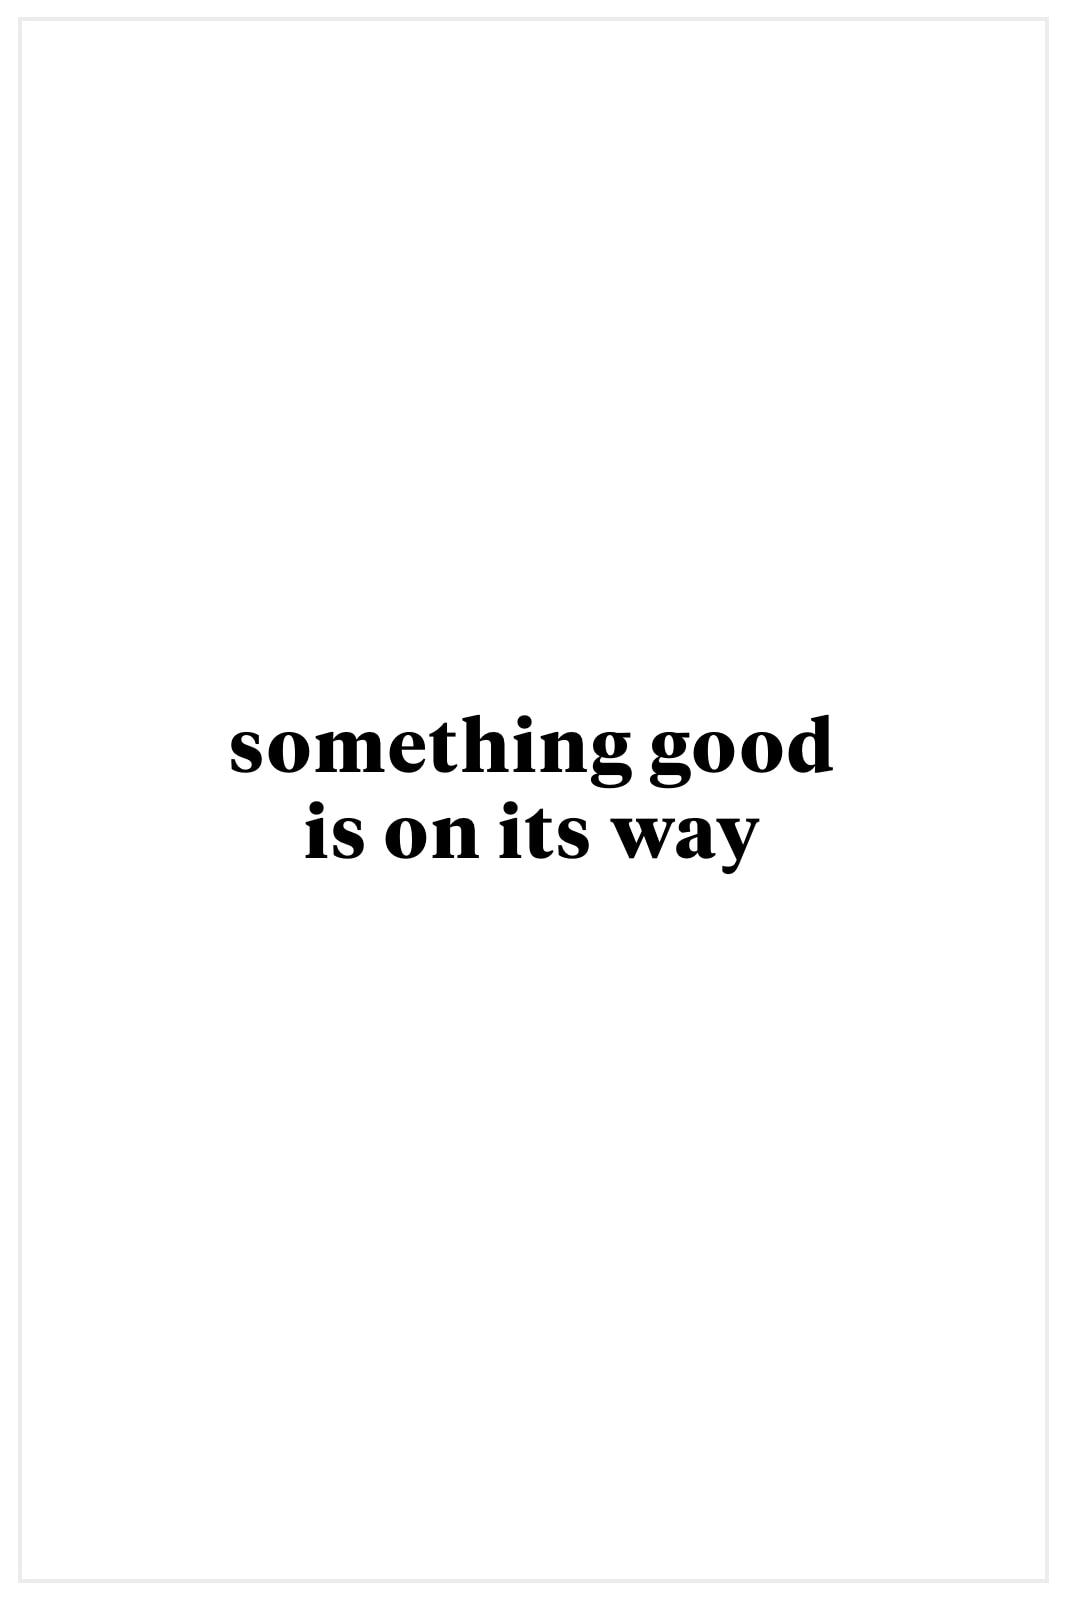 Sundry The Weekender Dress